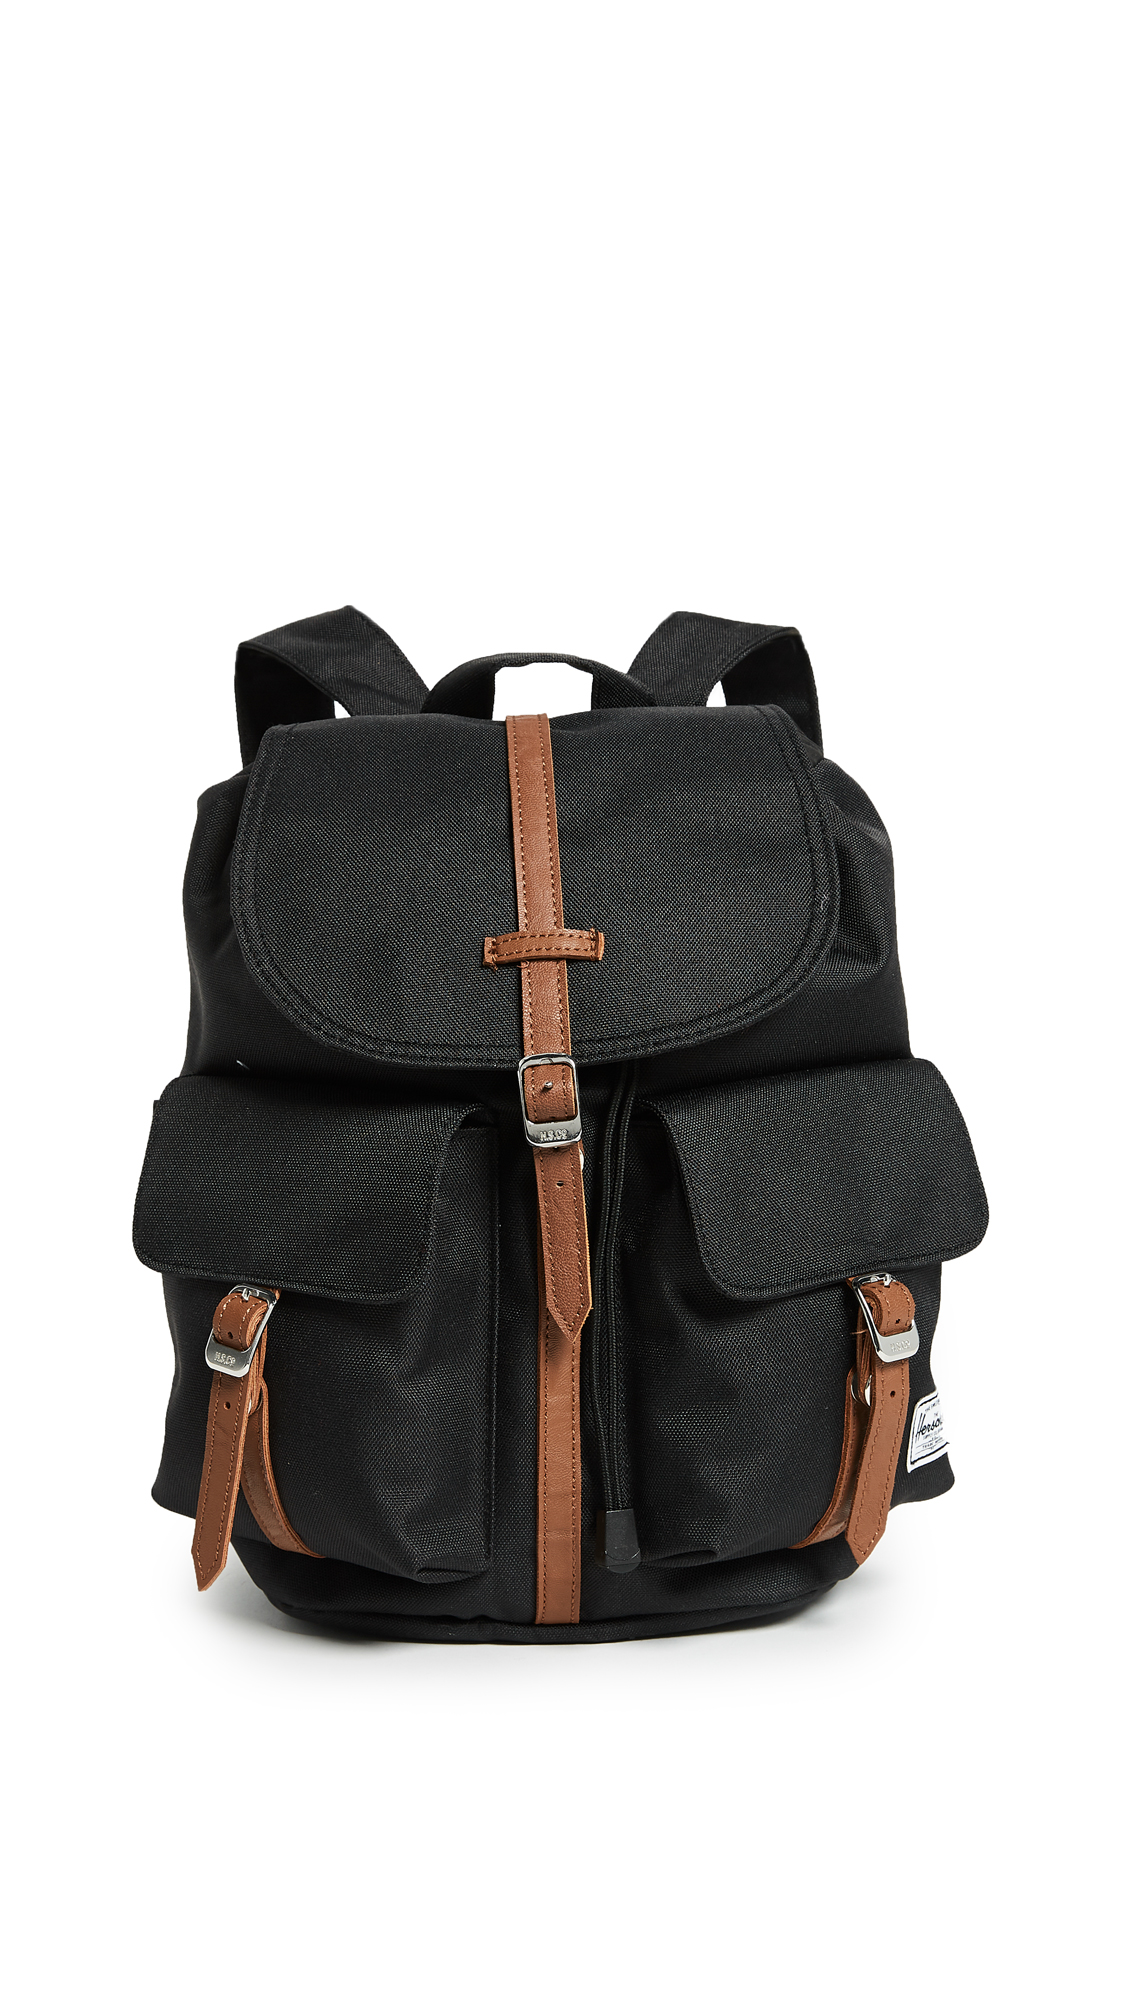 Herschel Supply Co. Dawson X-Small Backpack - Black/Tan